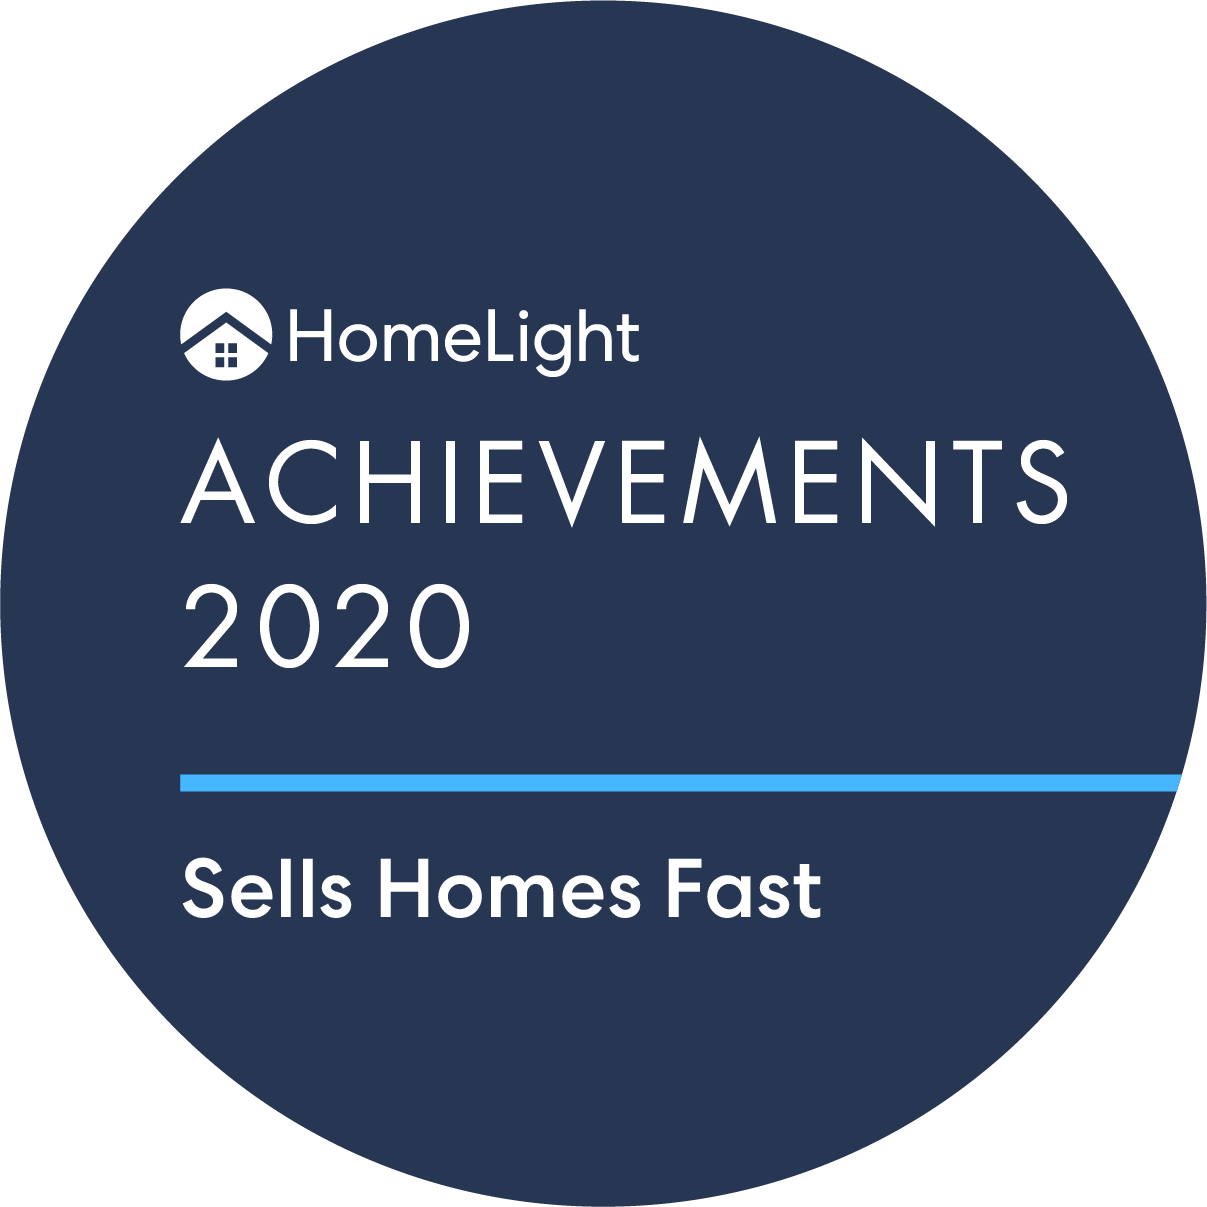 HomeLight Achievement Winner - John Heckenberg - Top California Real Estate Agent